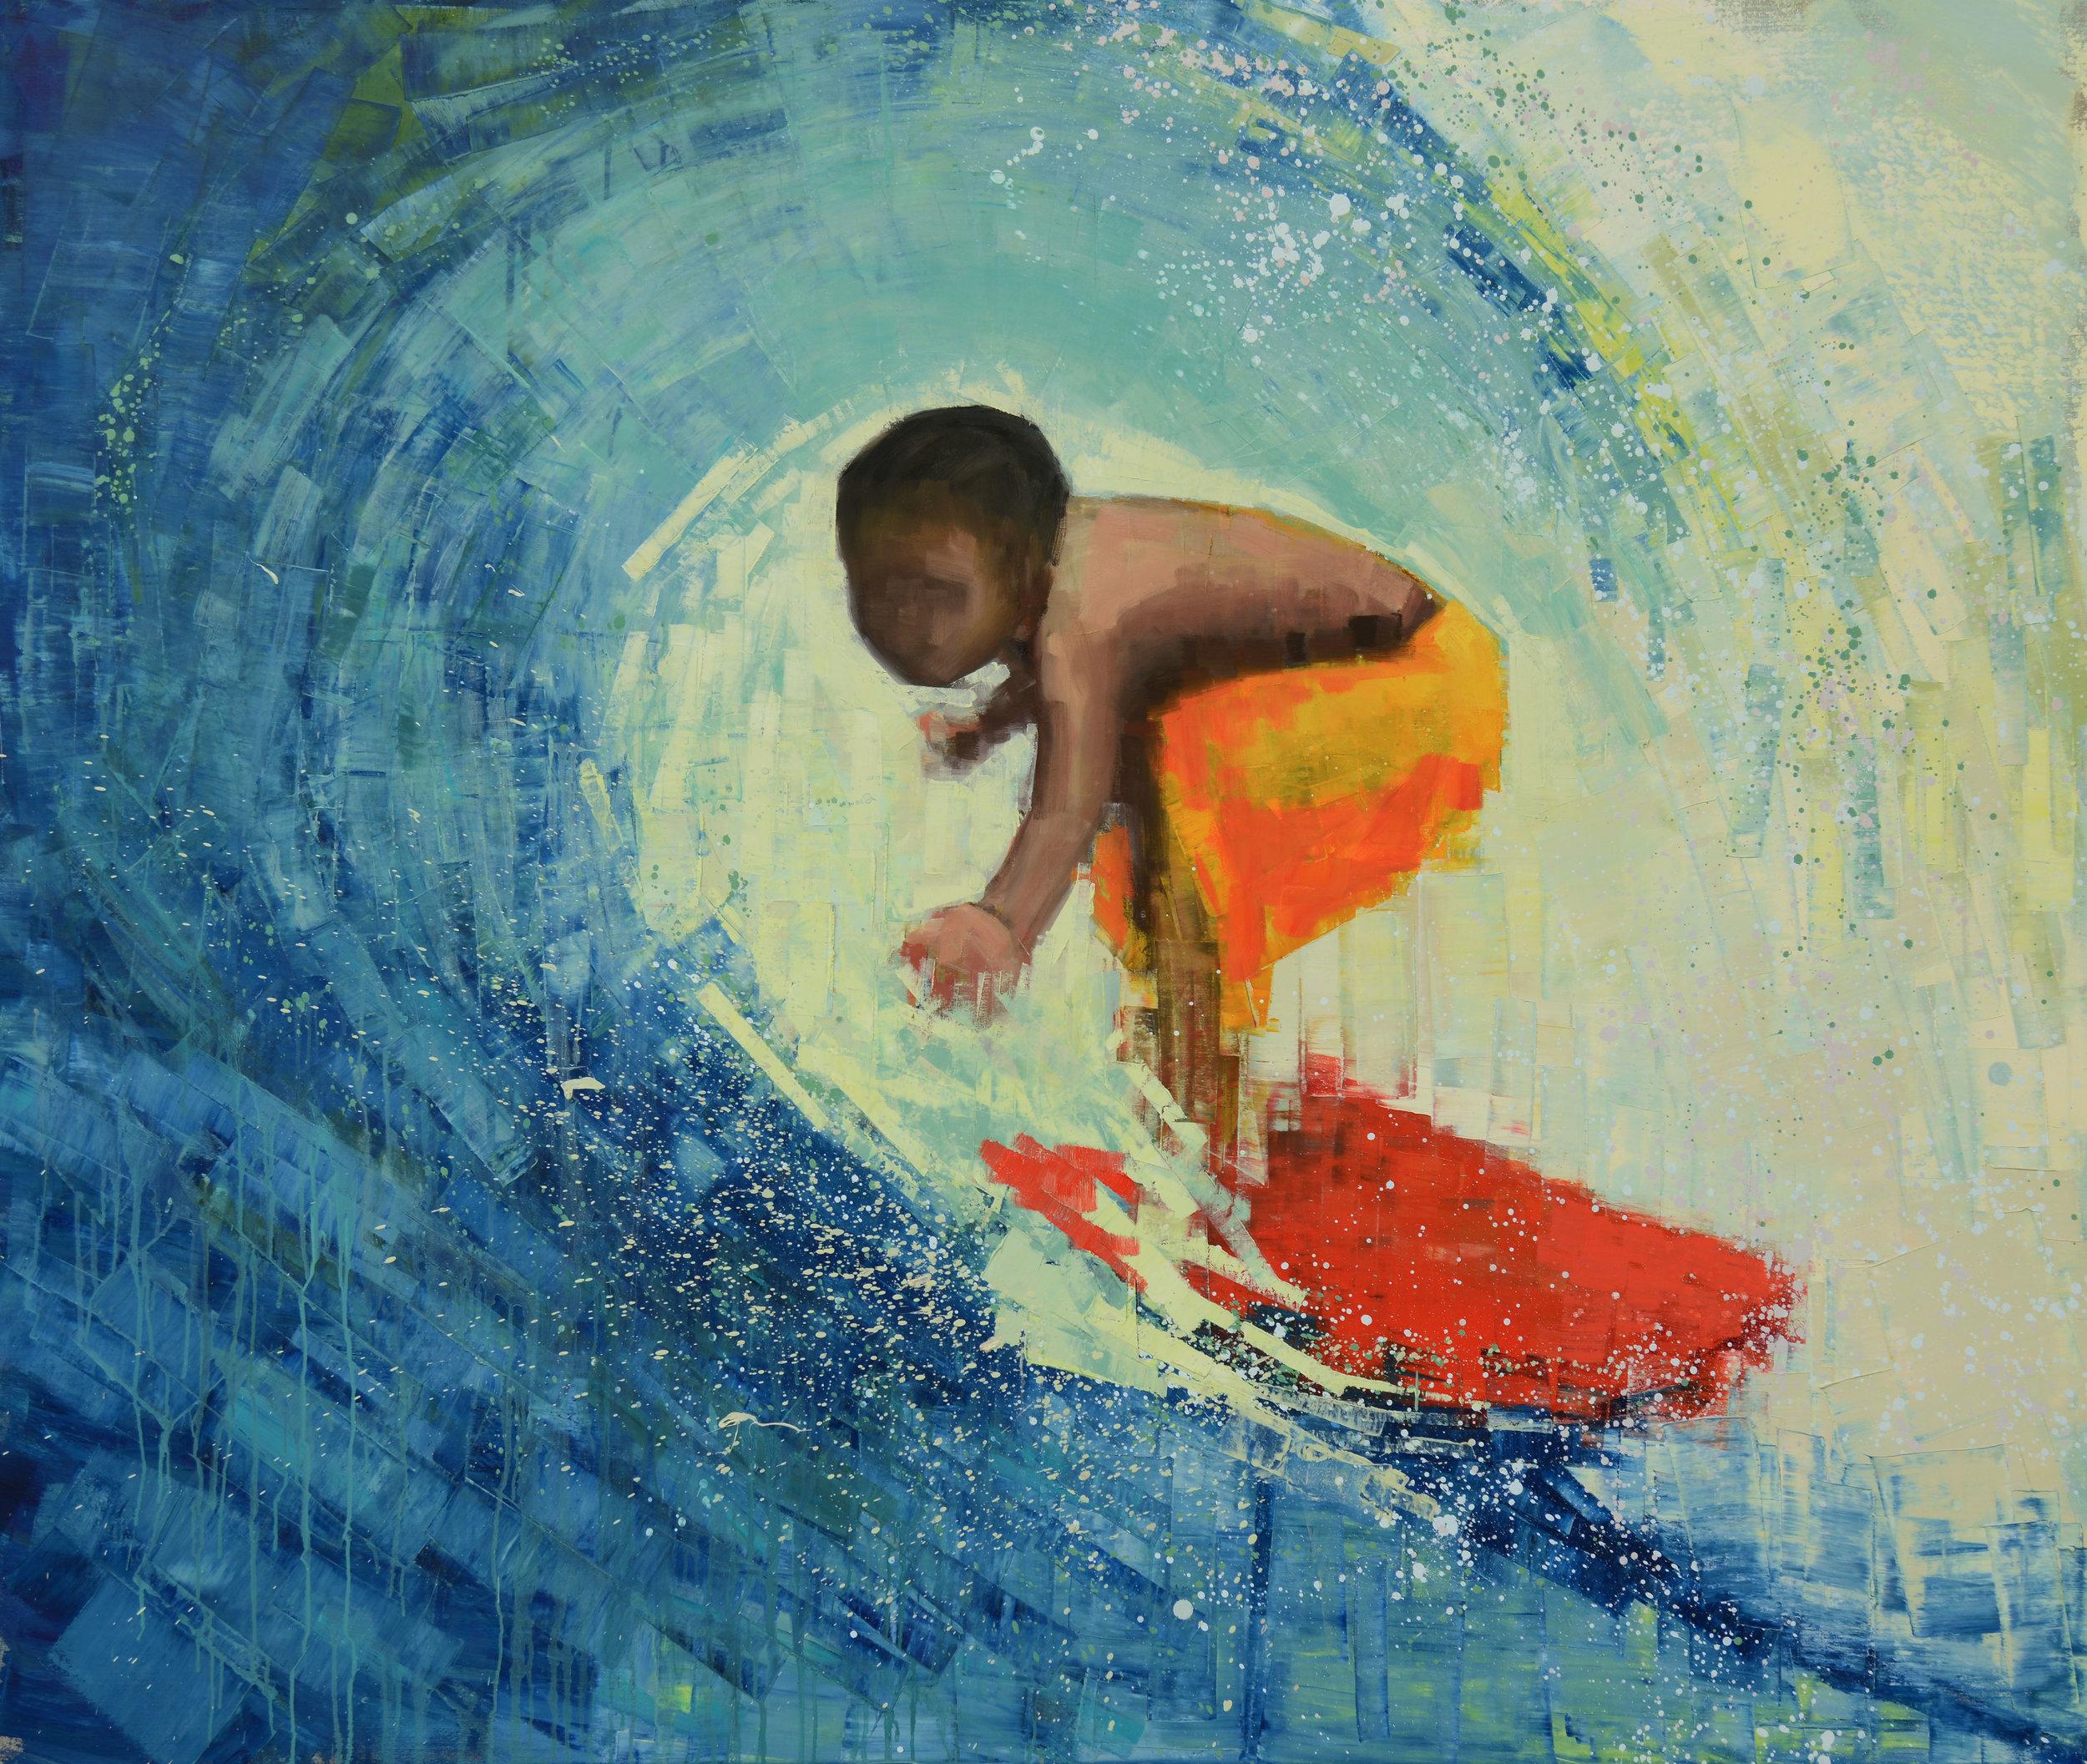 Surfer_59x70.jpg